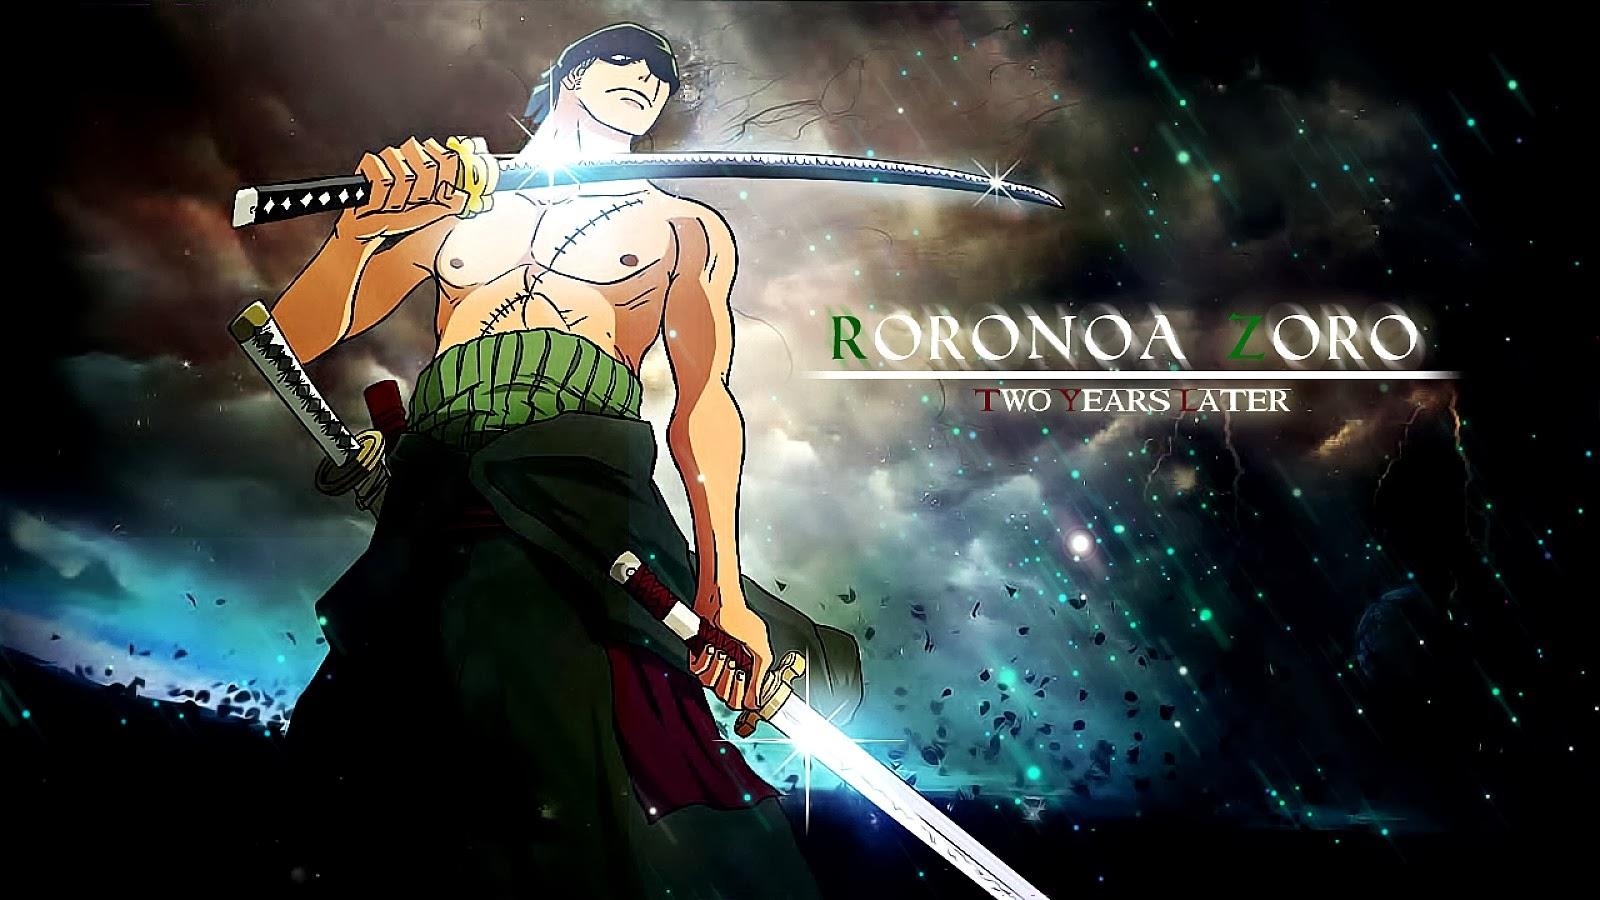 Roronoa Zoro Wallpapers